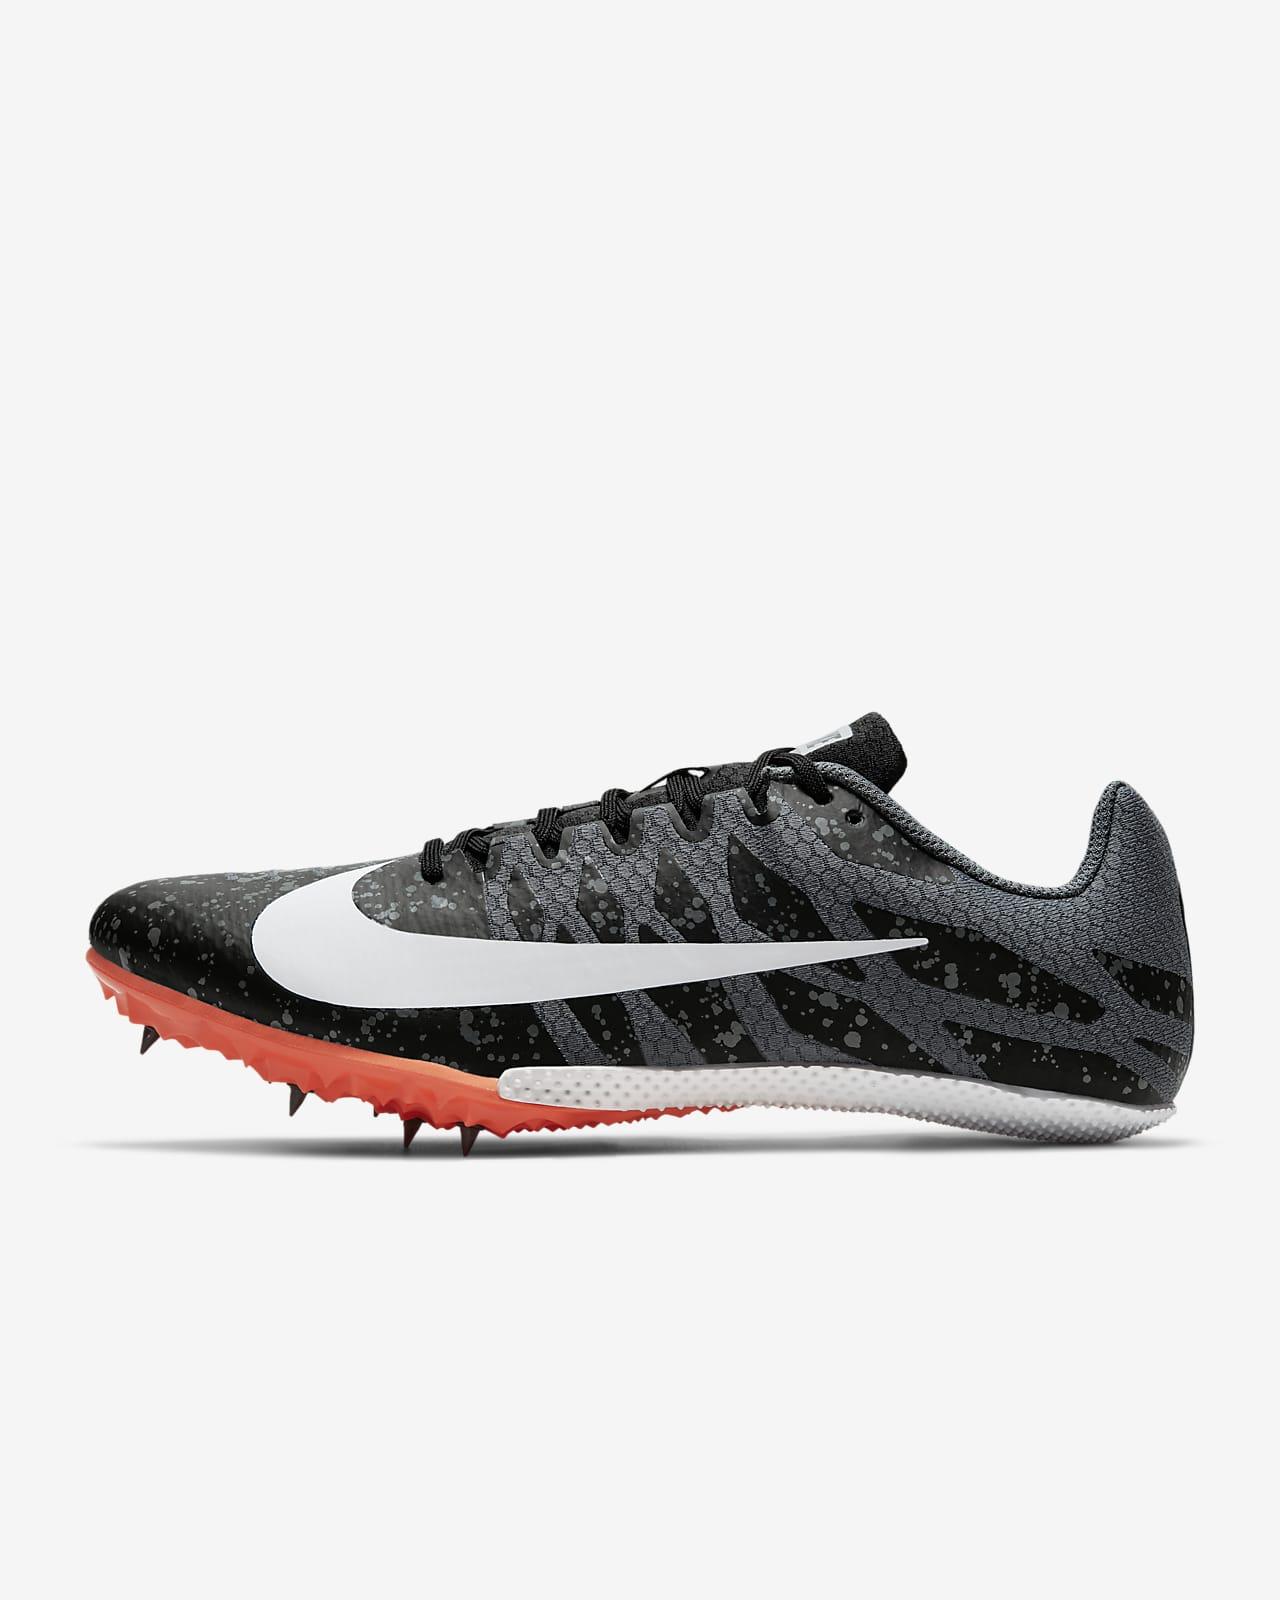 Kolce startowe Nike Zoom Rival S 9